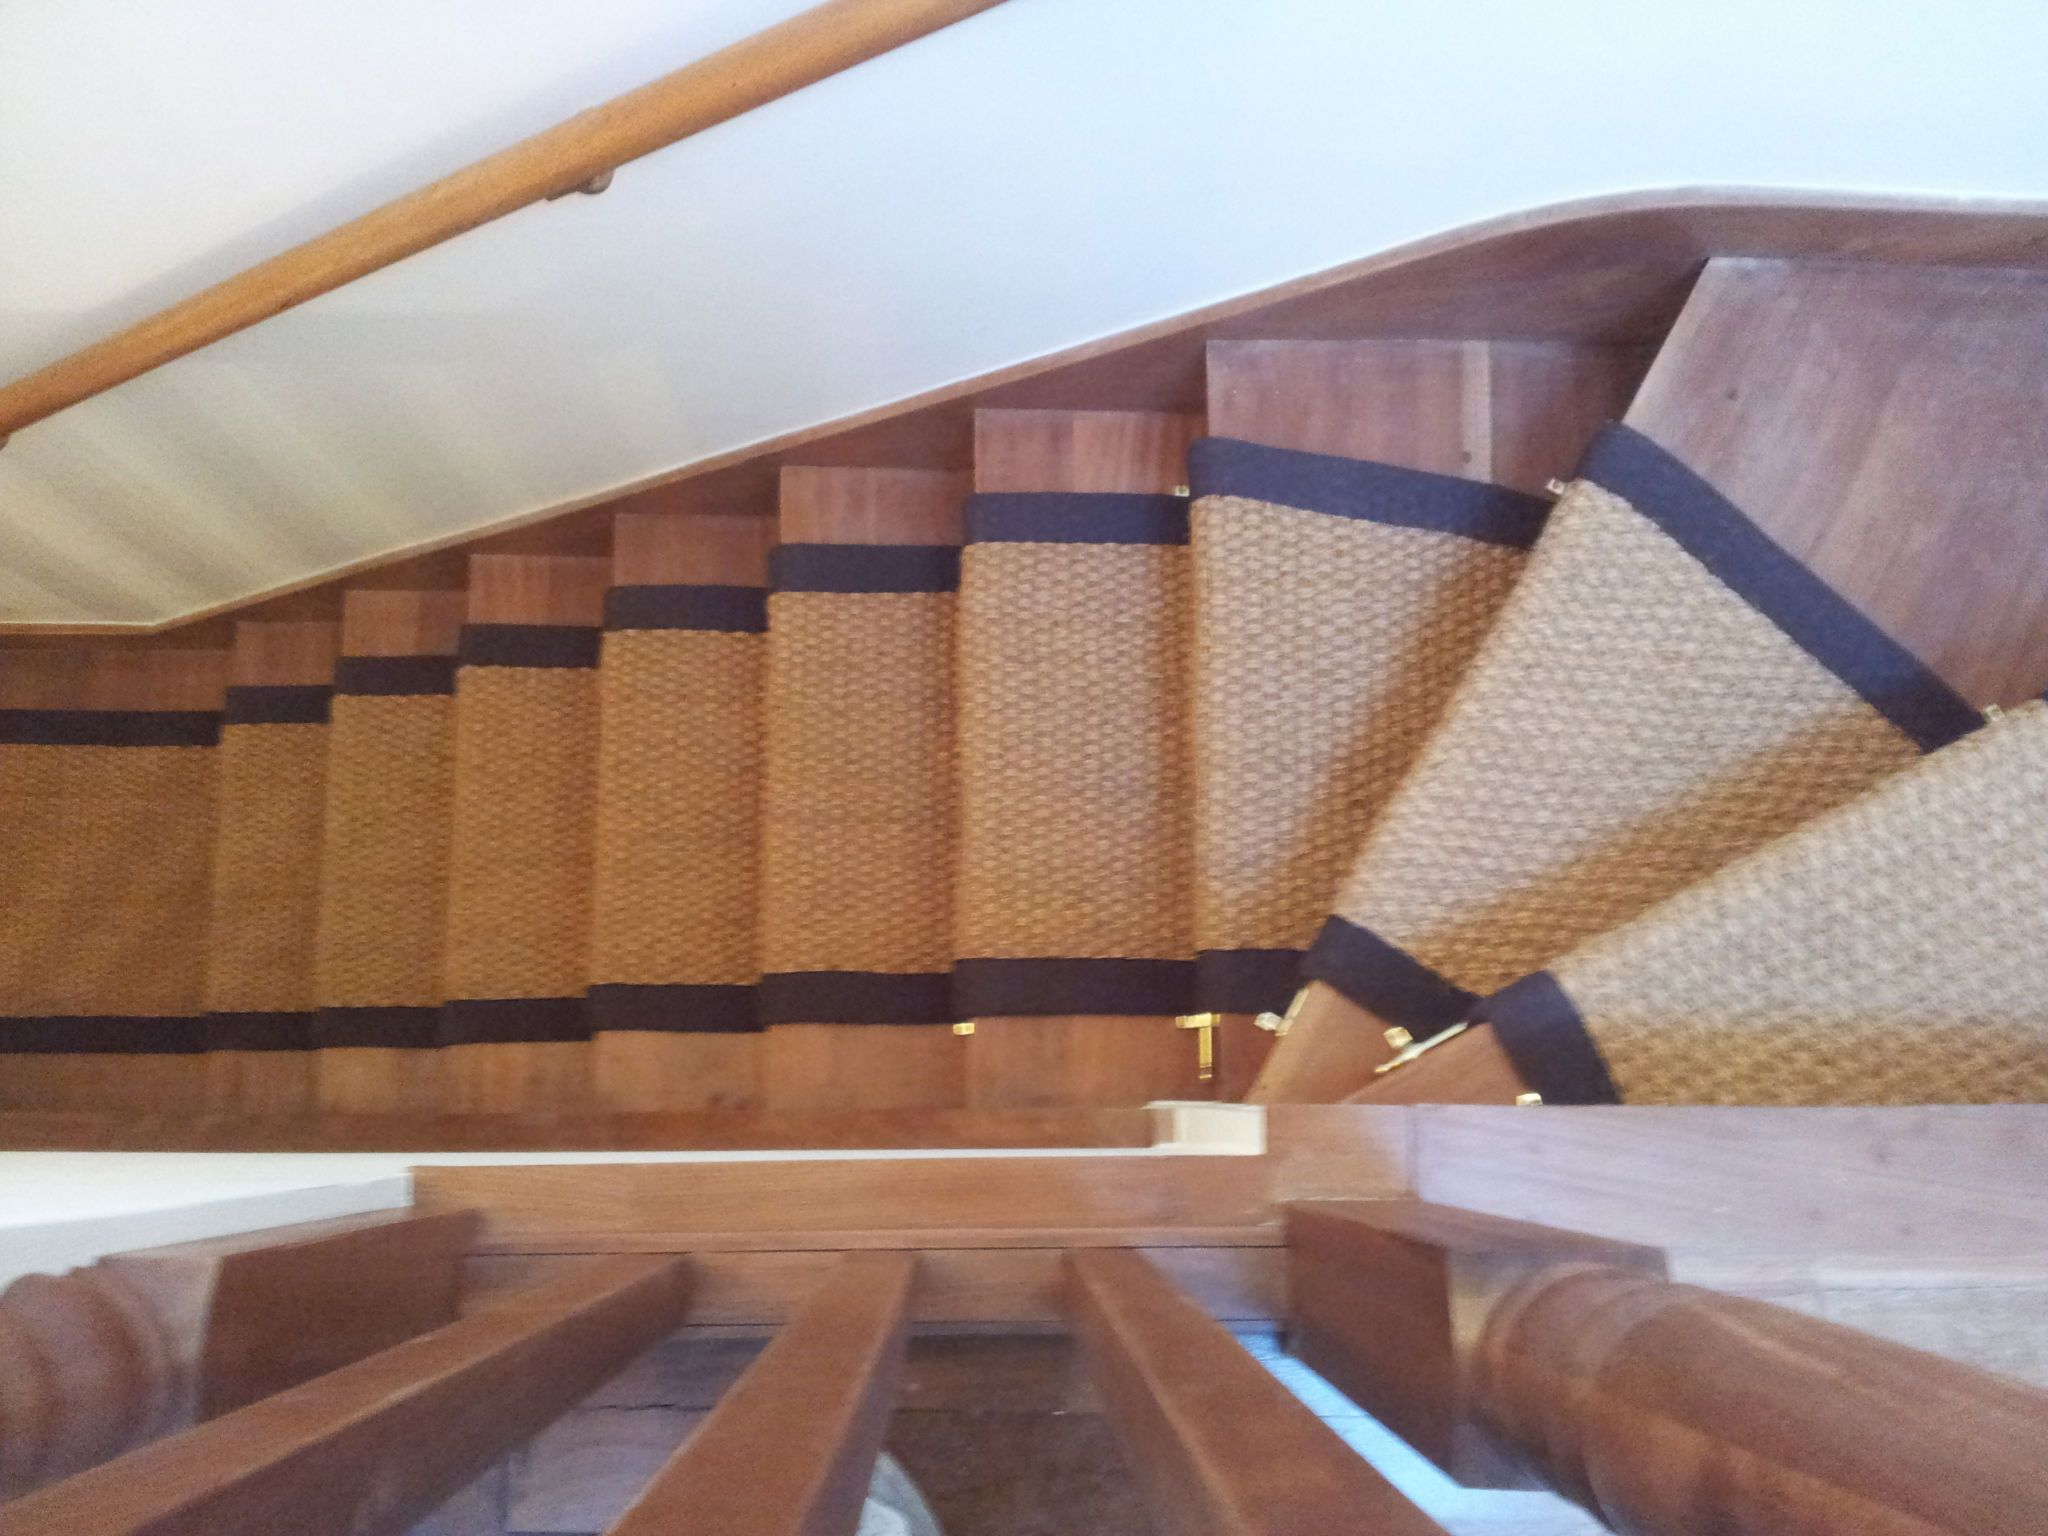 Best Stair Runner Coir Panama Natural 7 5Mx55Cm Or 65Cm 400 x 300